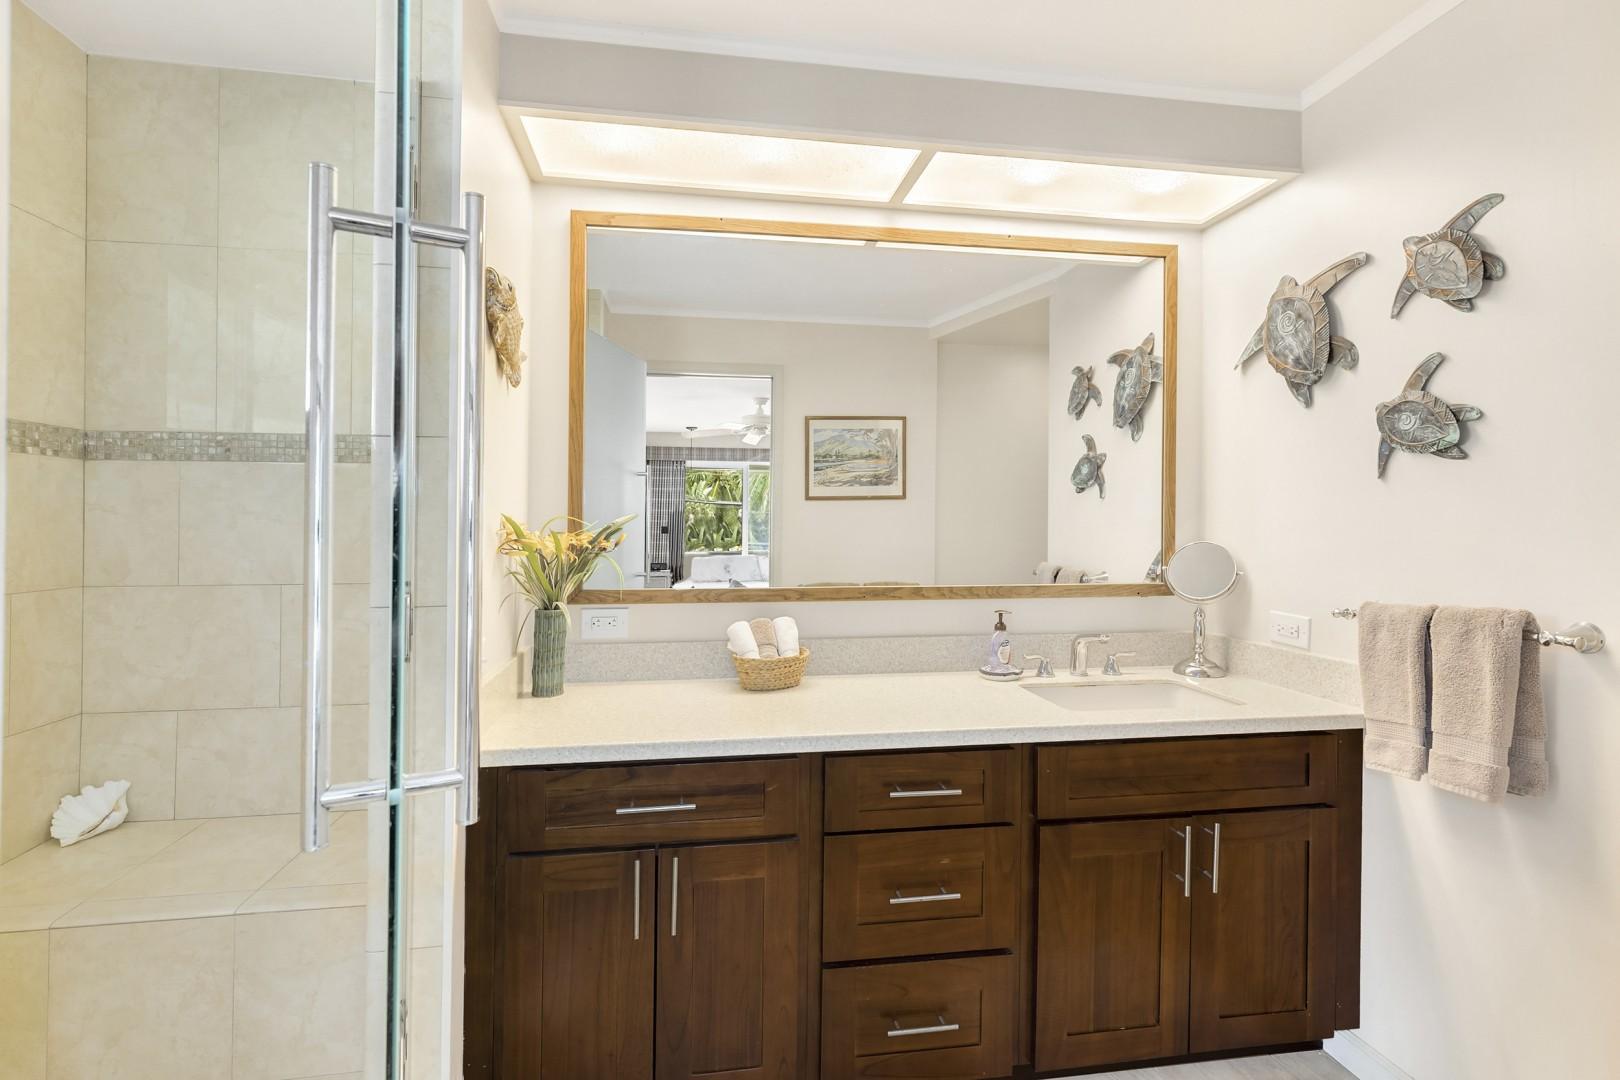 Master ensuite bathroom upstairs with custom shower.